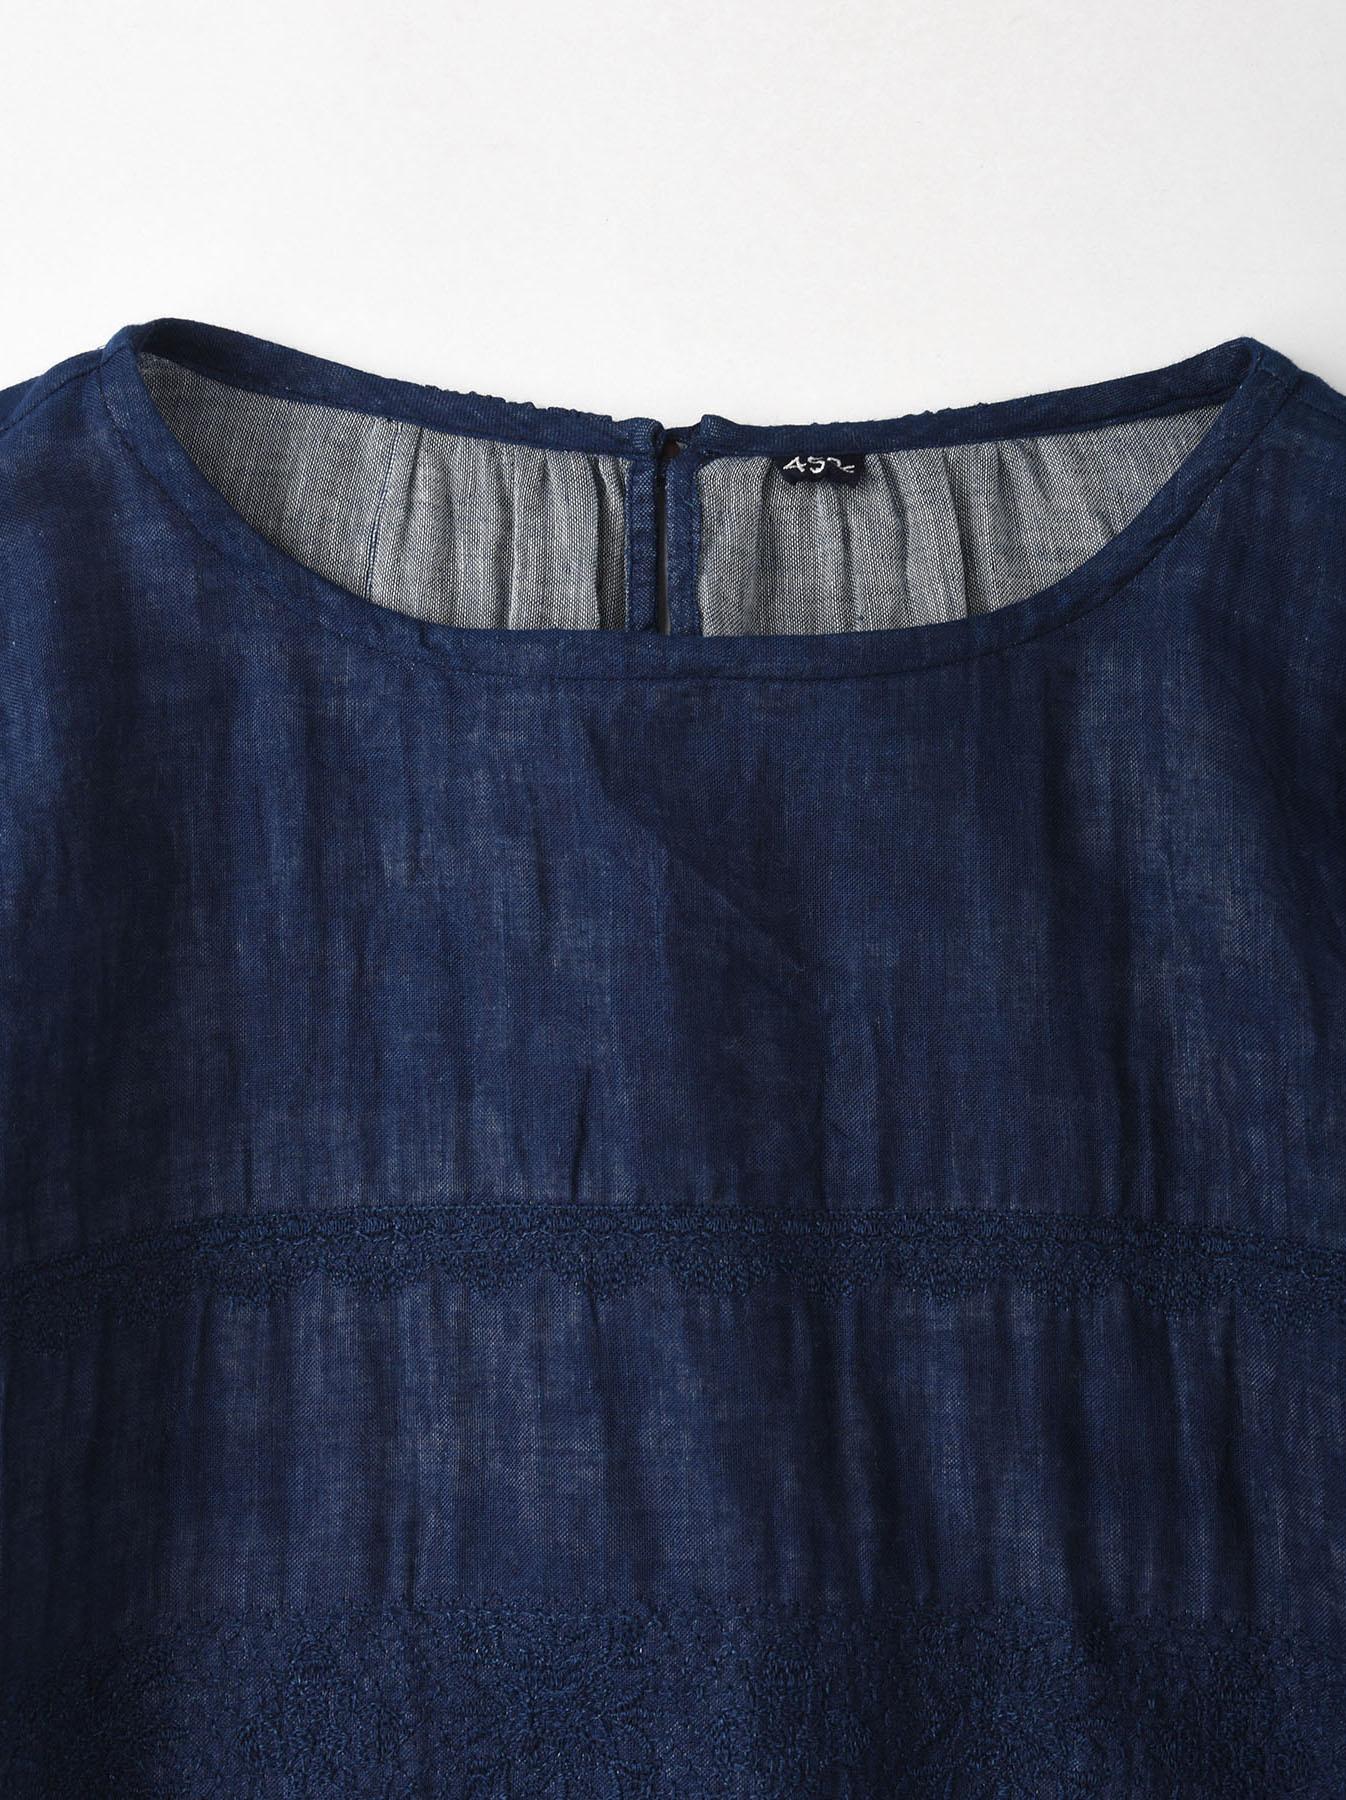 Indigo Double Cloth Lace Embroidery Dress-5